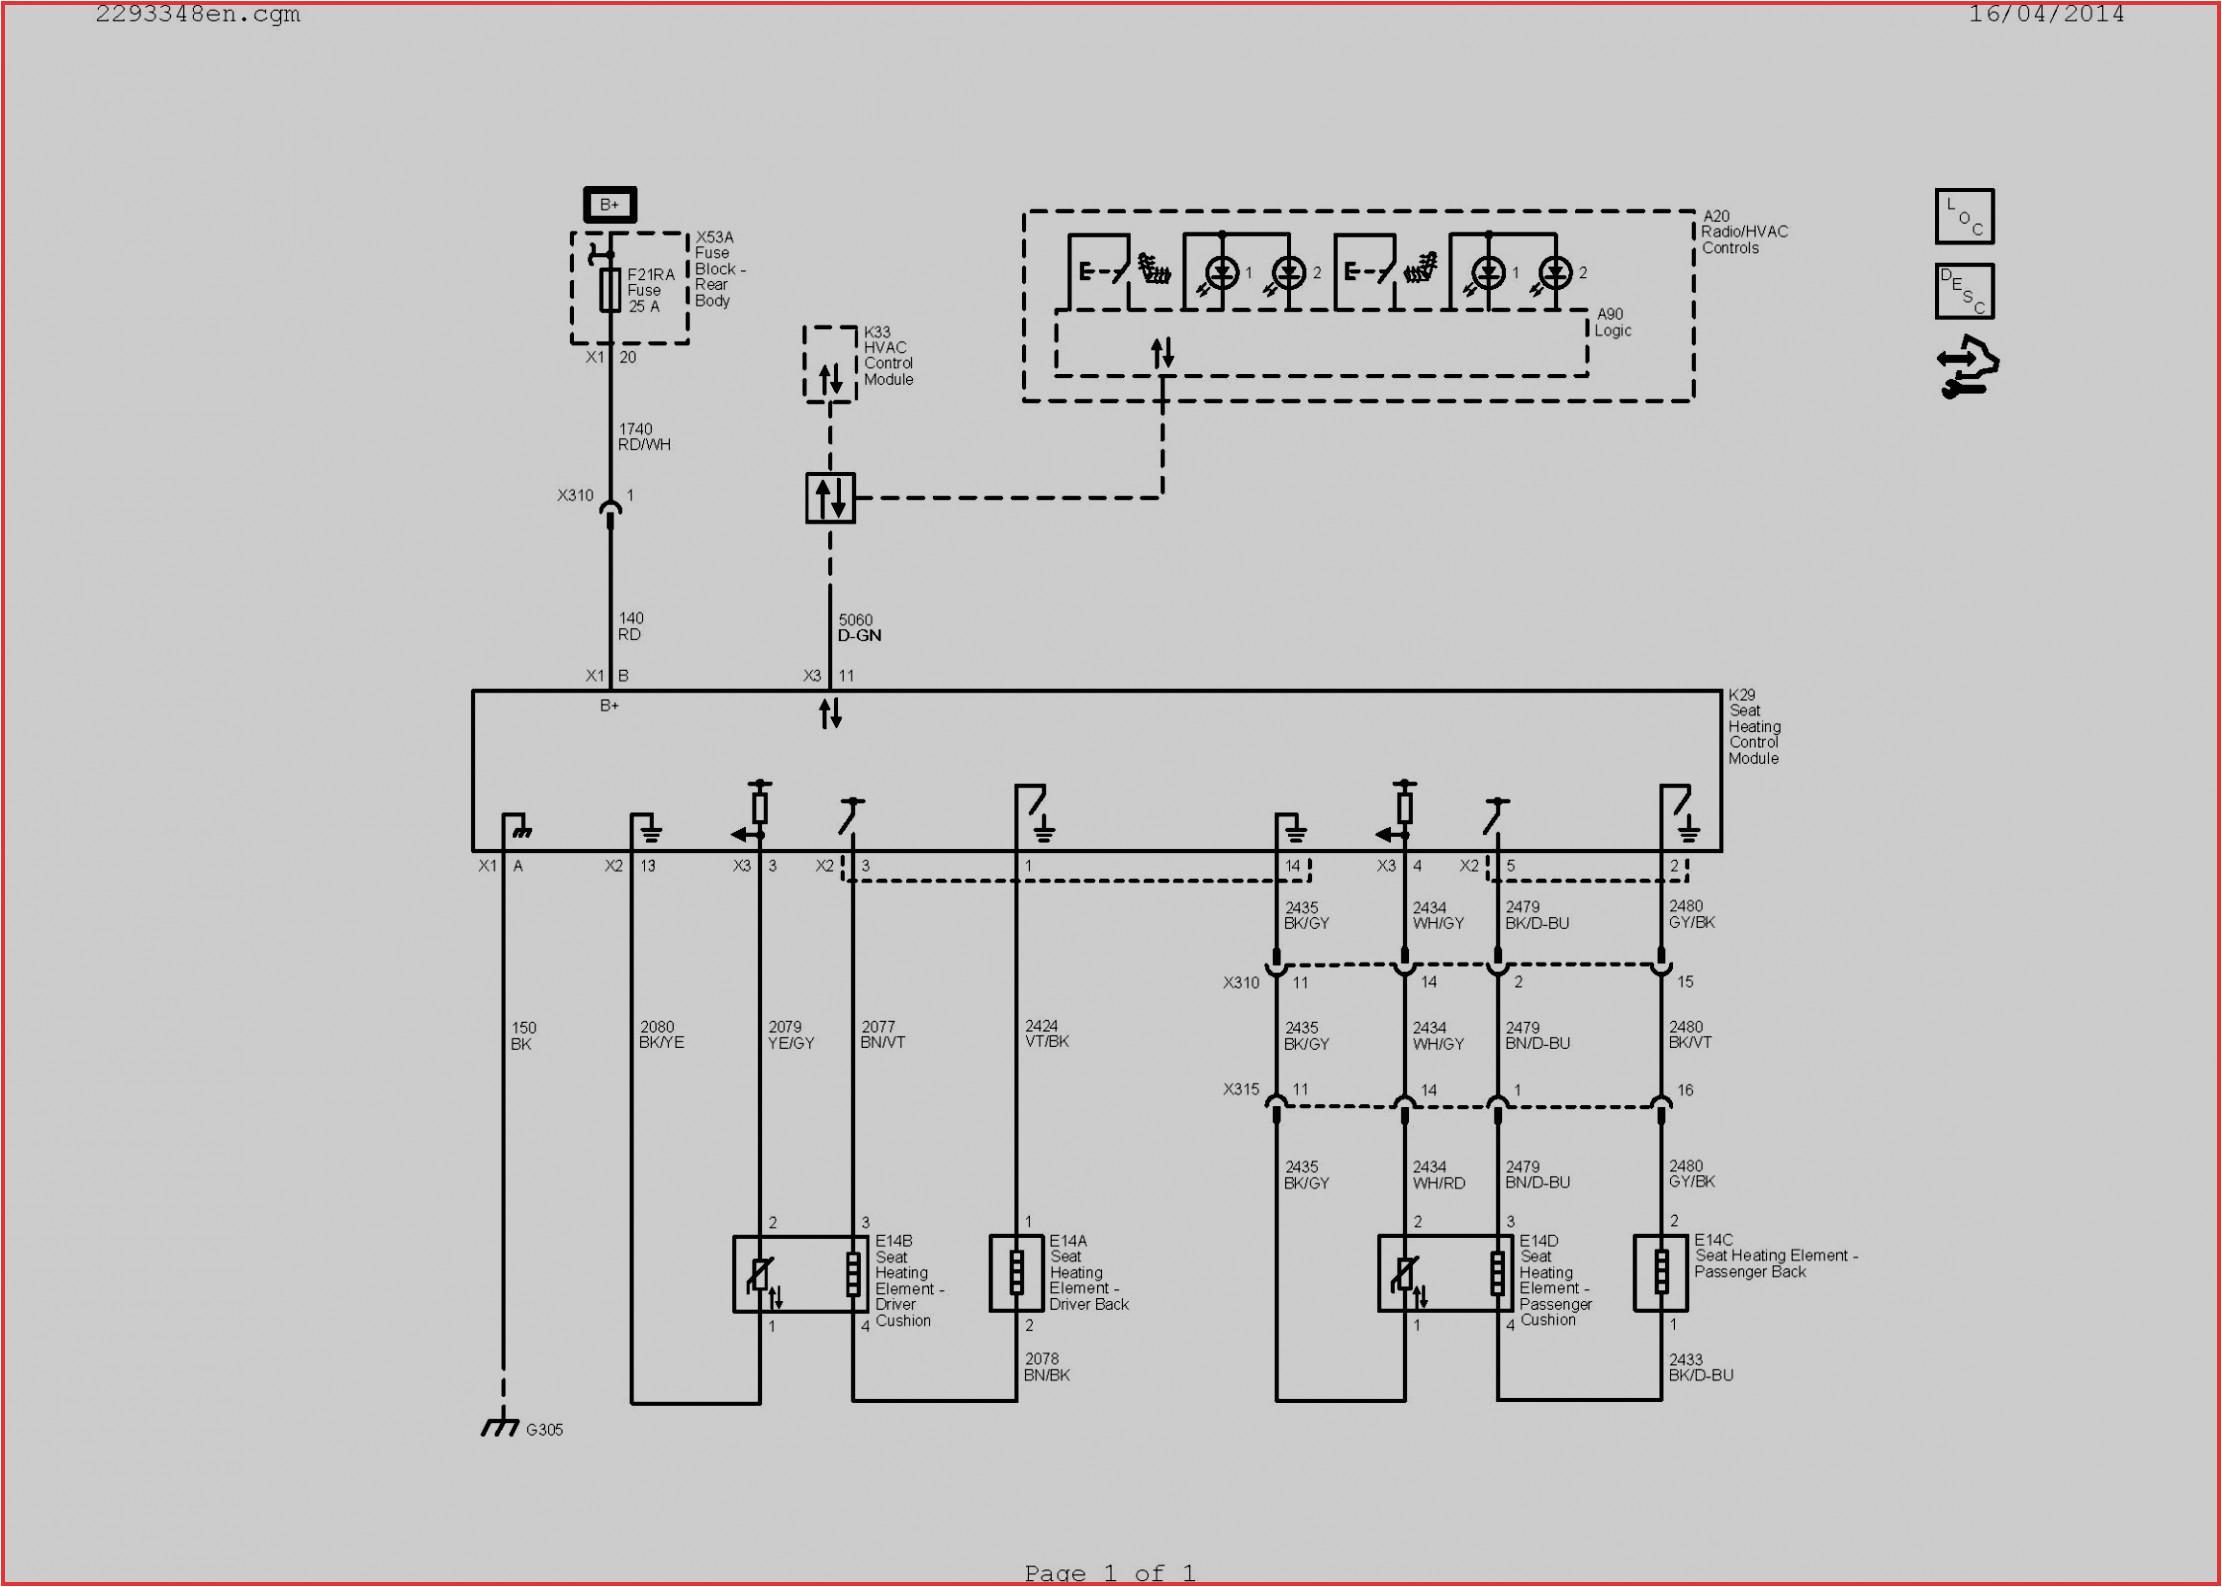 trailer plug wiring diagram 5 way best 4 way trailer plug wiring diagram graphics of trailer plug wiring diagram 5 way jpg